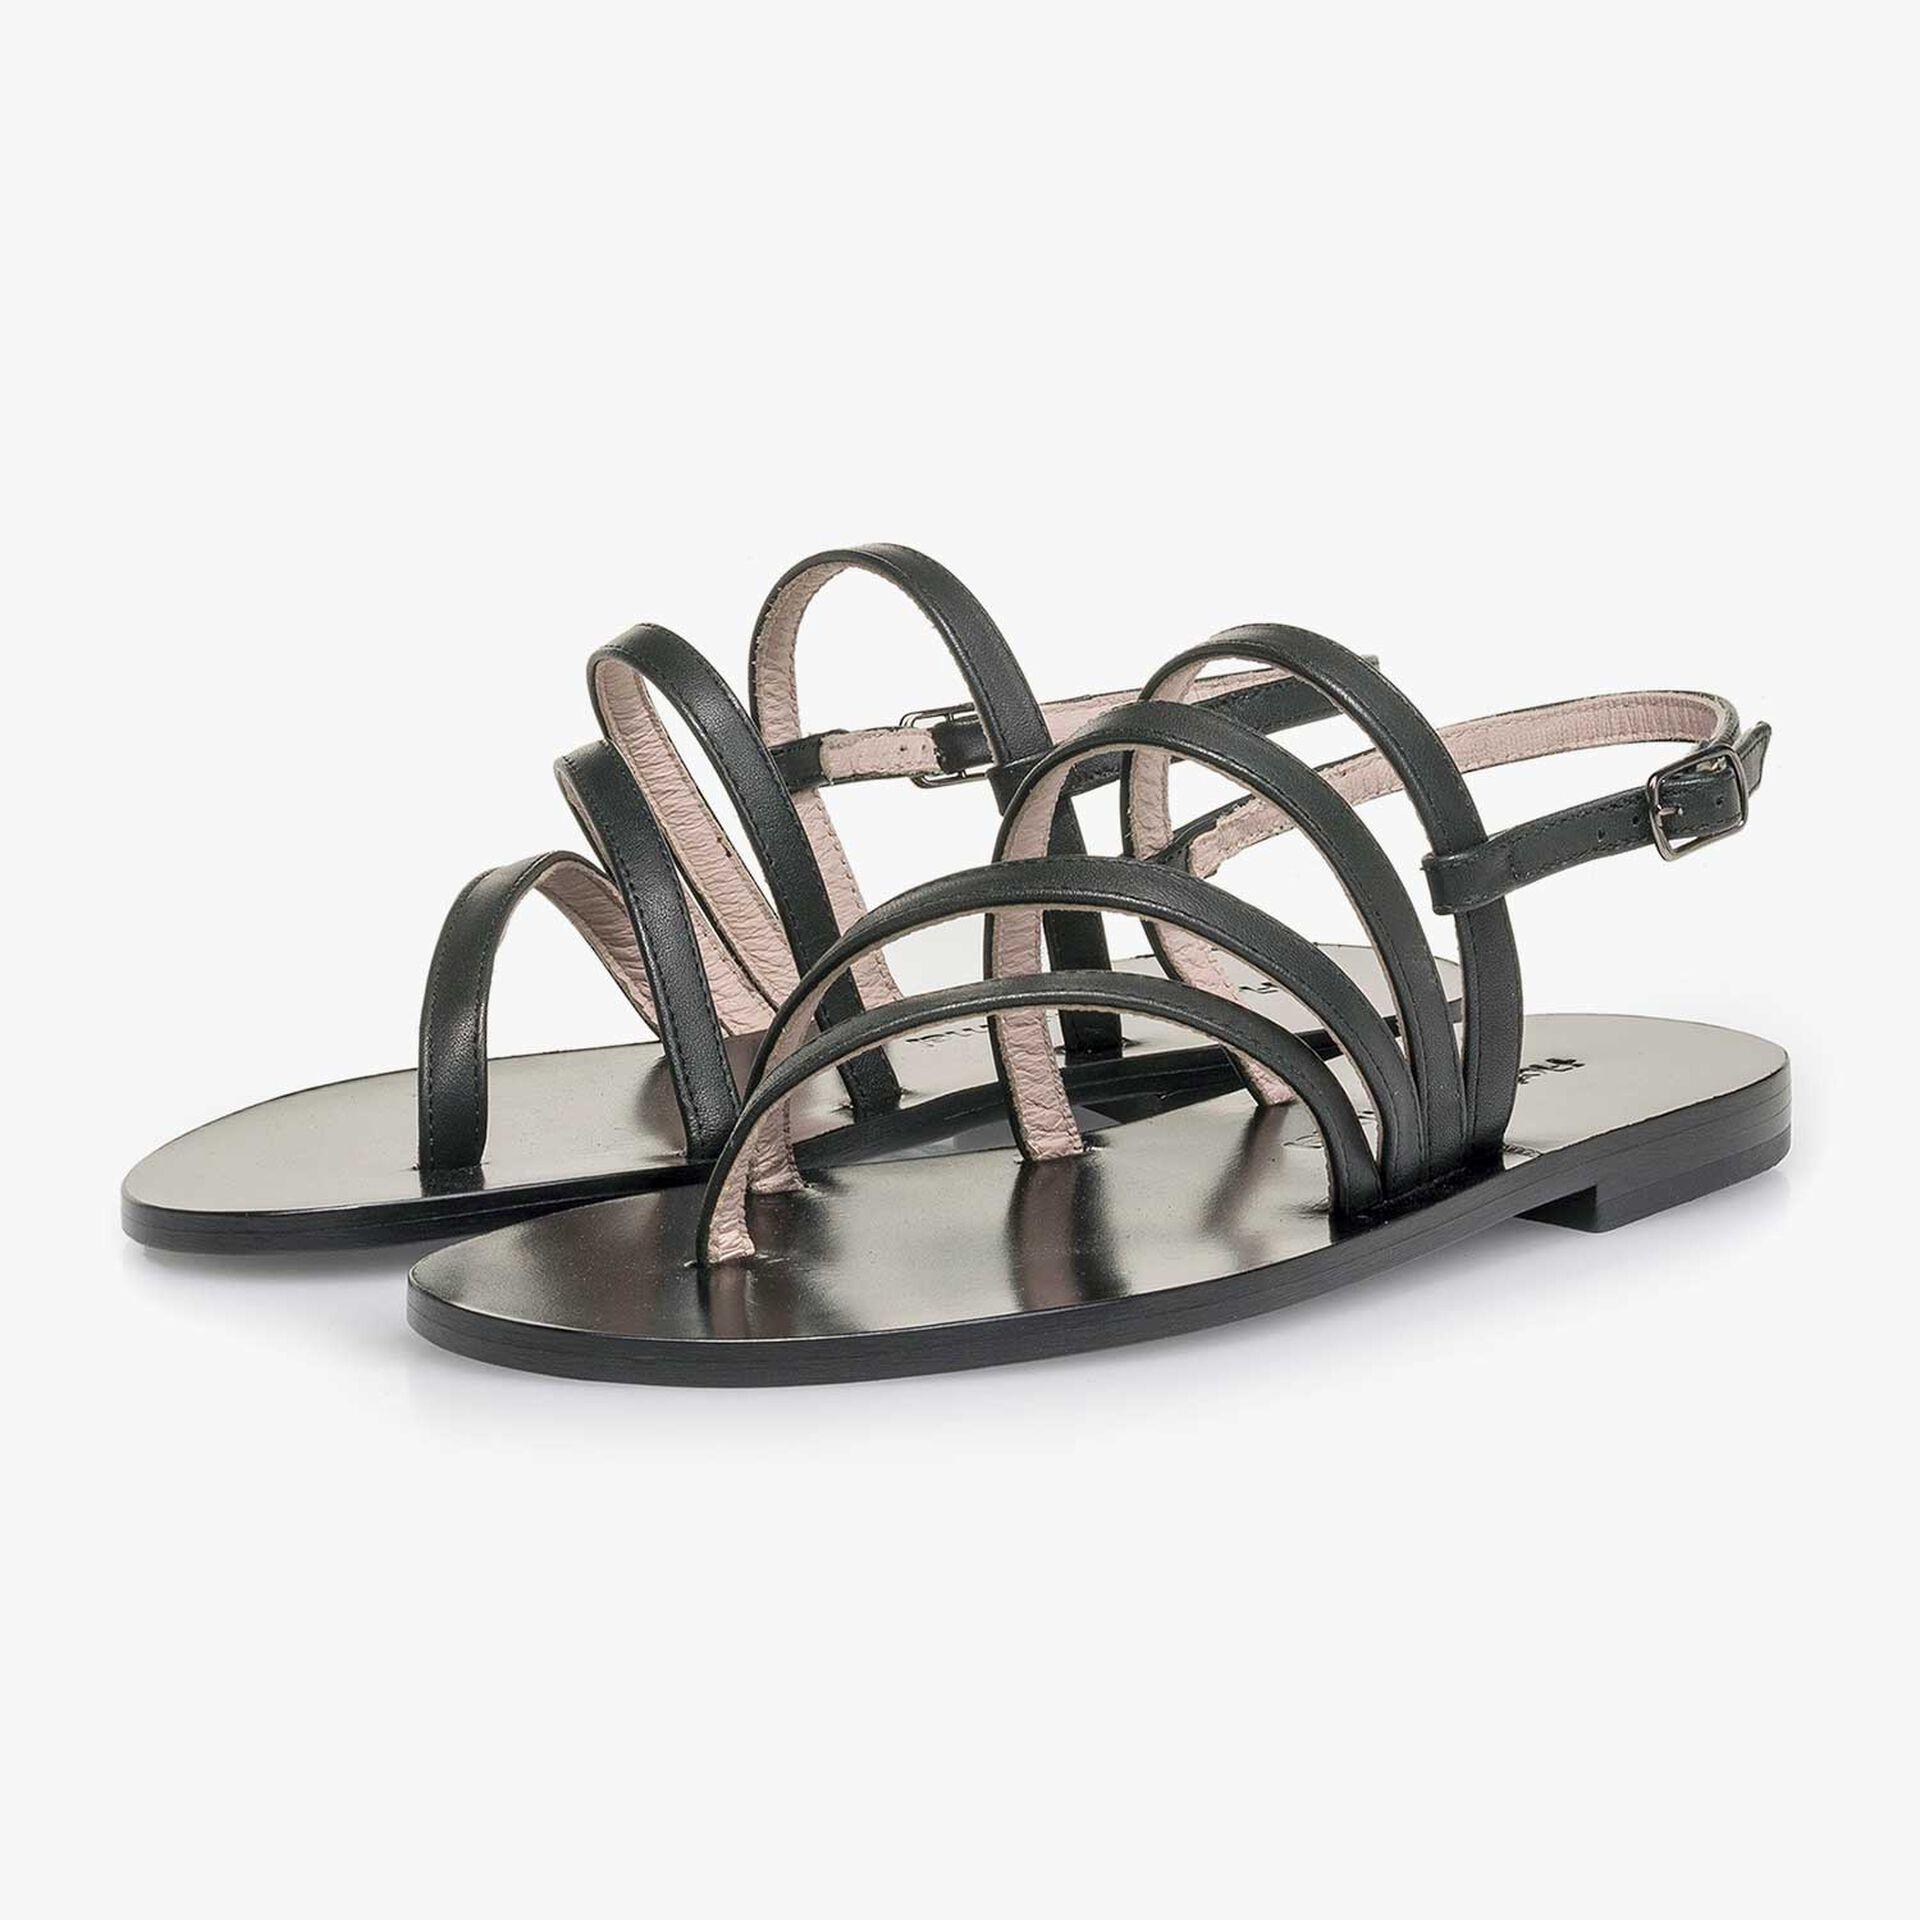 Zwarte kalfsleren sandaal